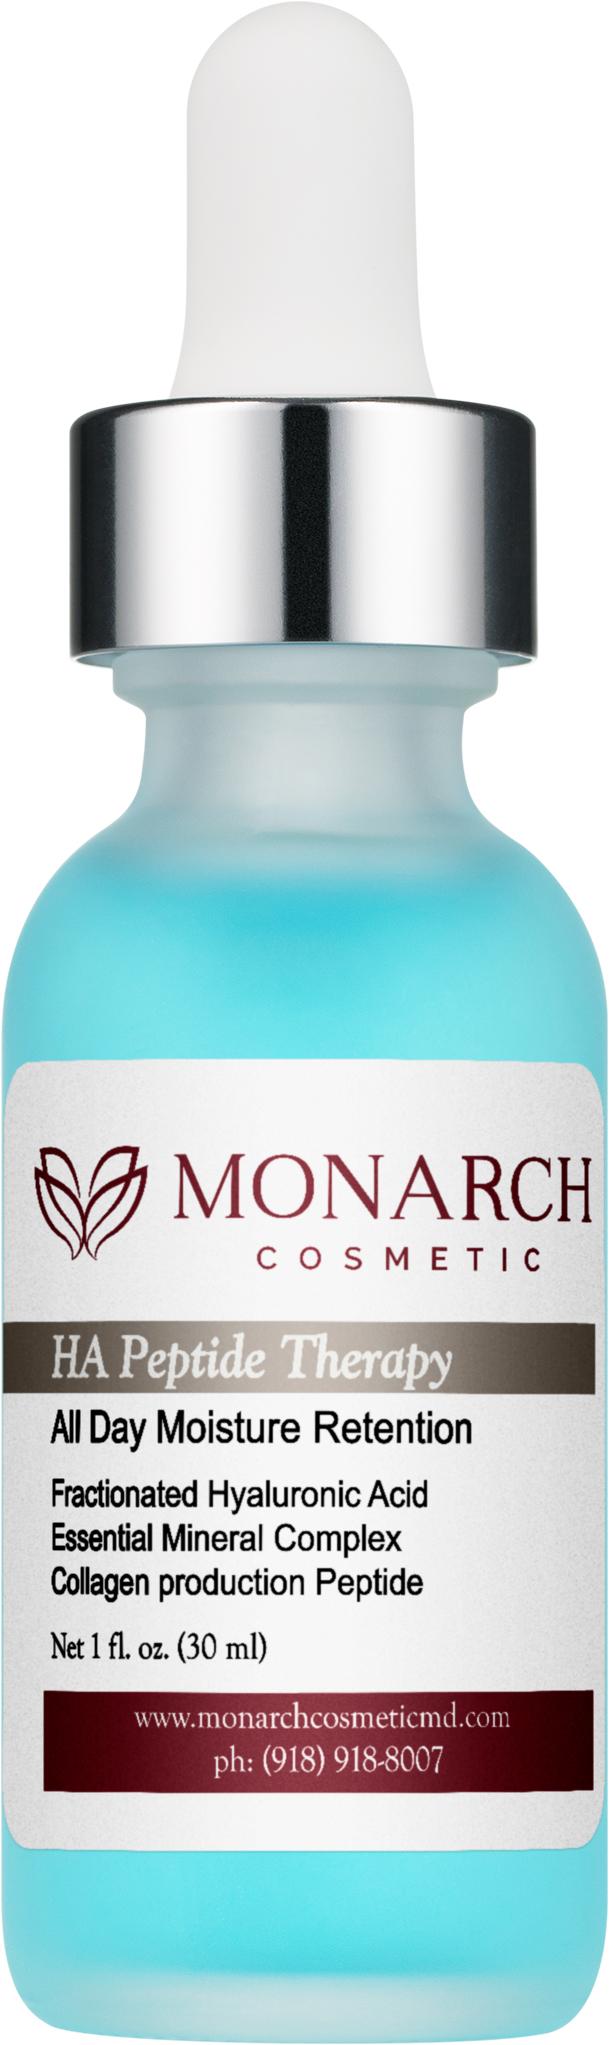 Monarch Cosmetic Topix Obagi Elta Md Allergan Merz Skin Medica Monarch Cosmetic Md